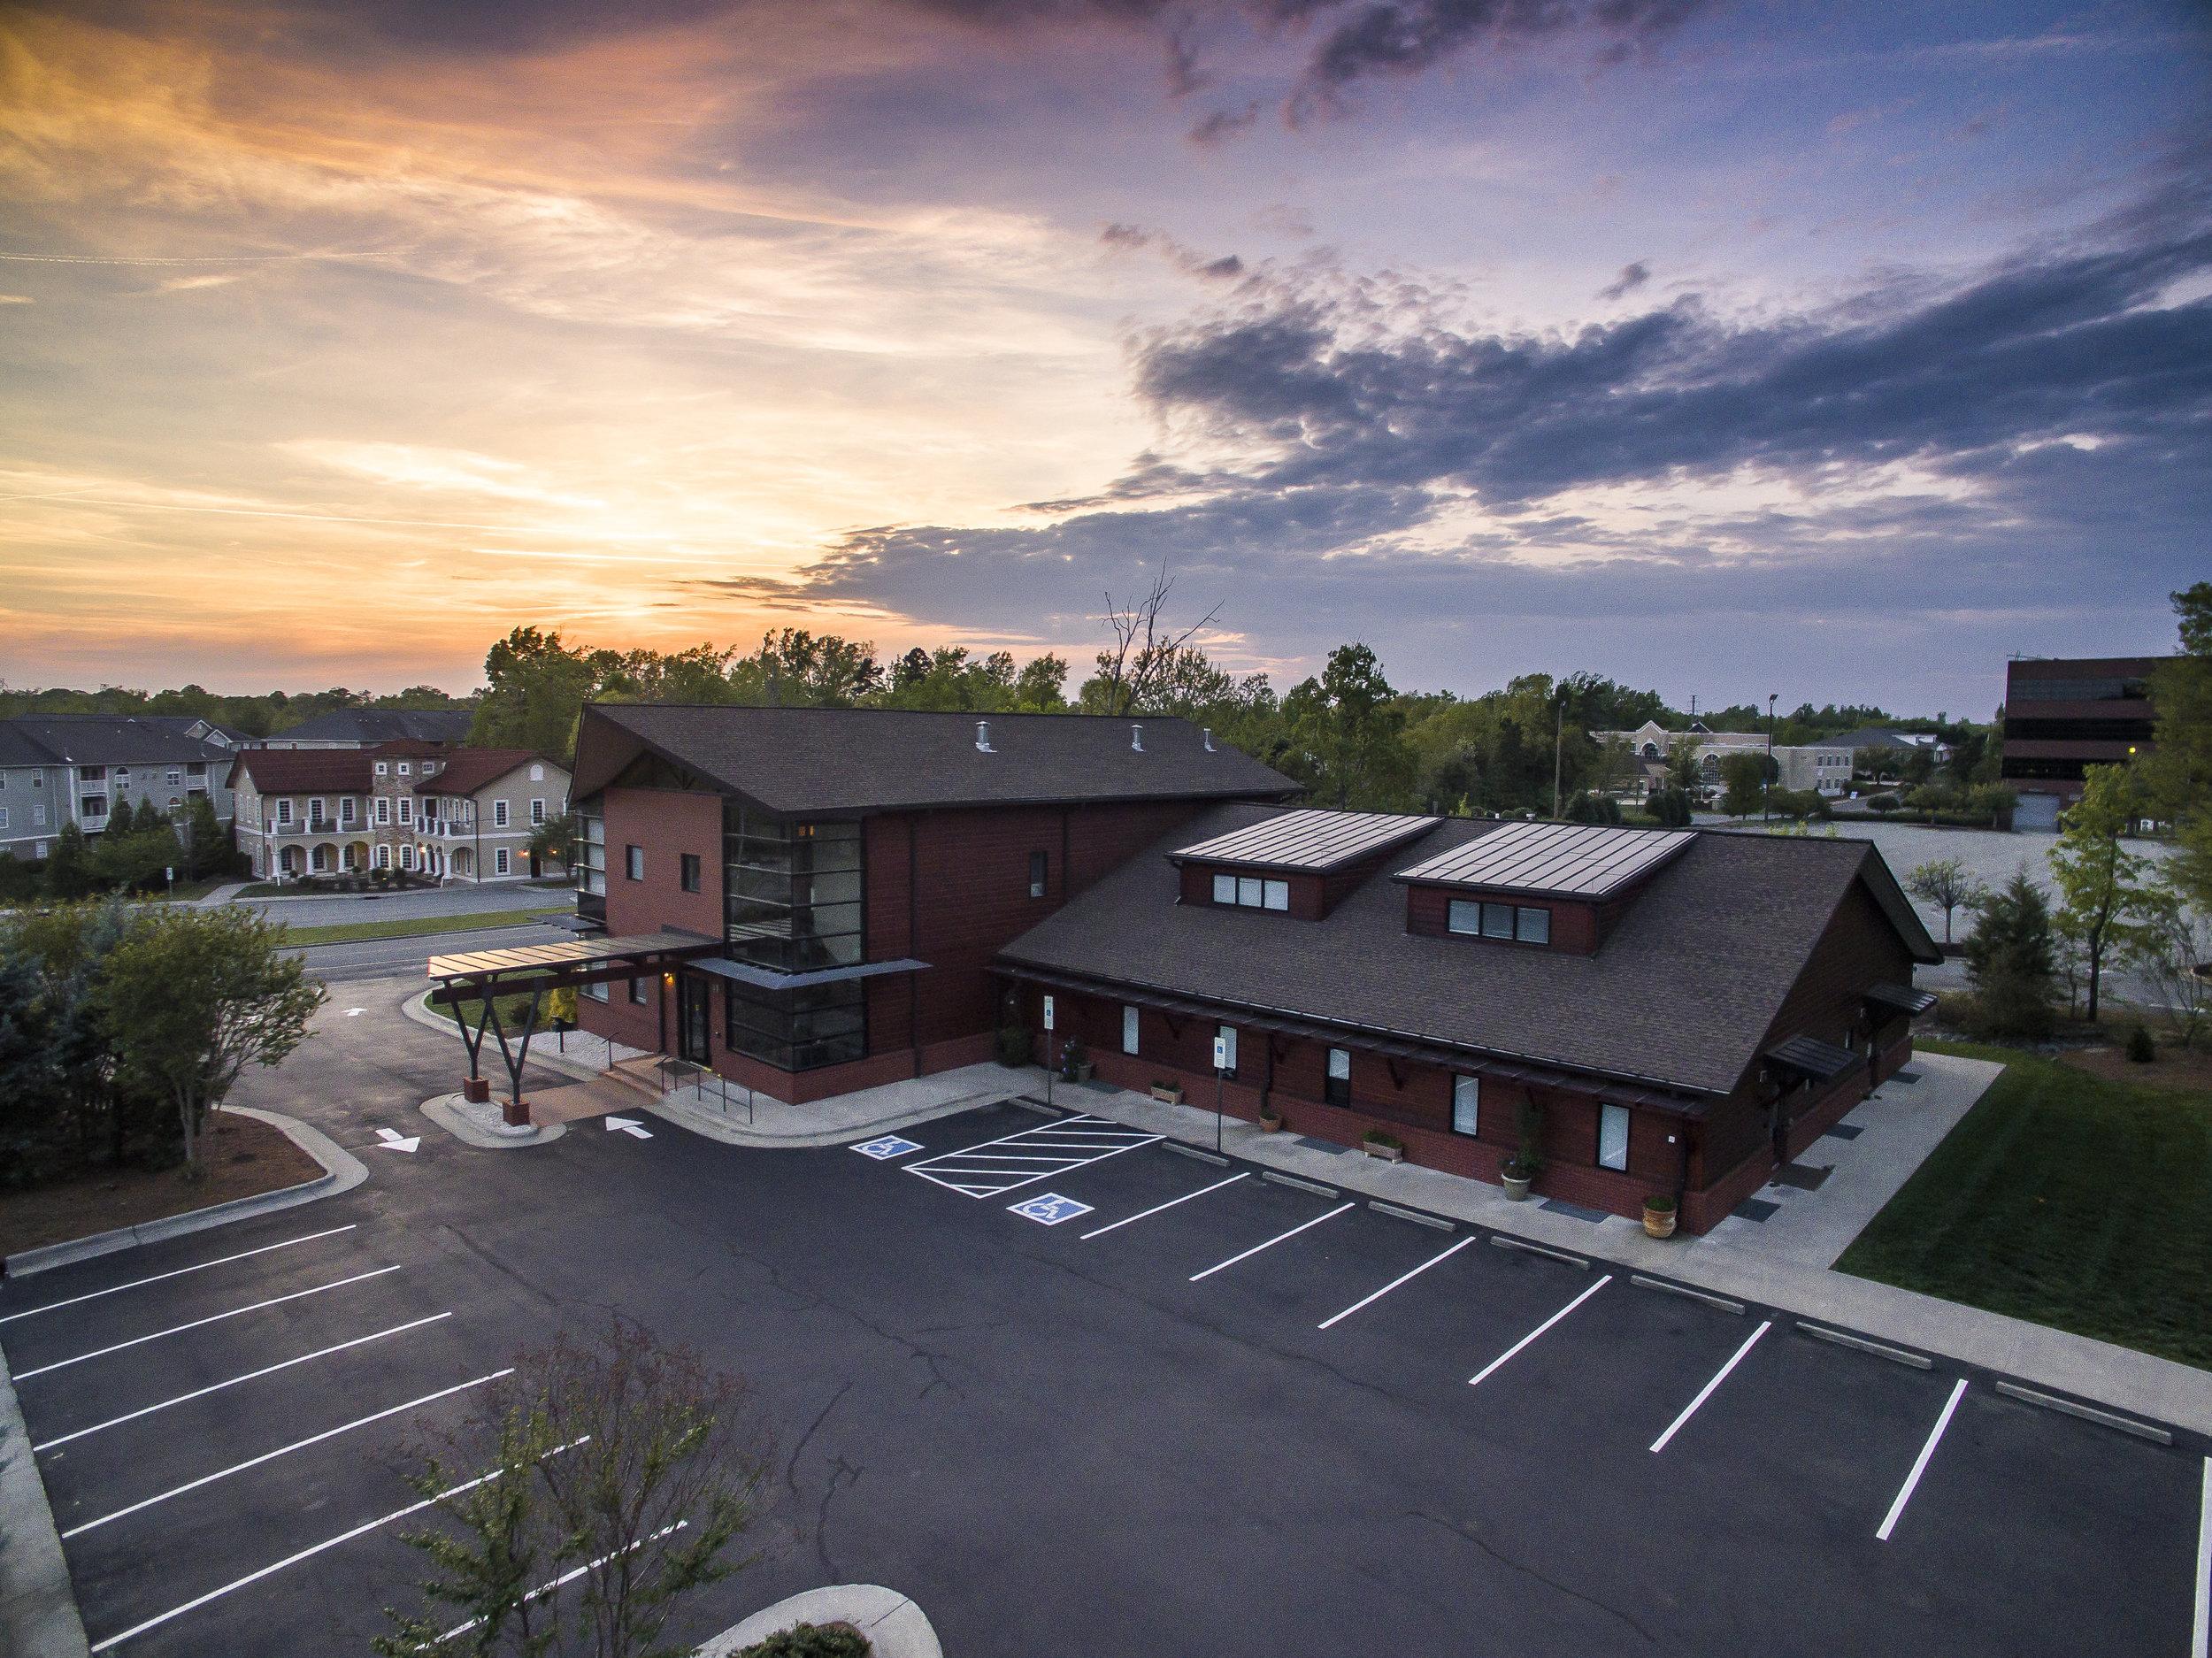 real-estate-photography-drone-photographer-drone-greensboro-nc-triad-219.jpg